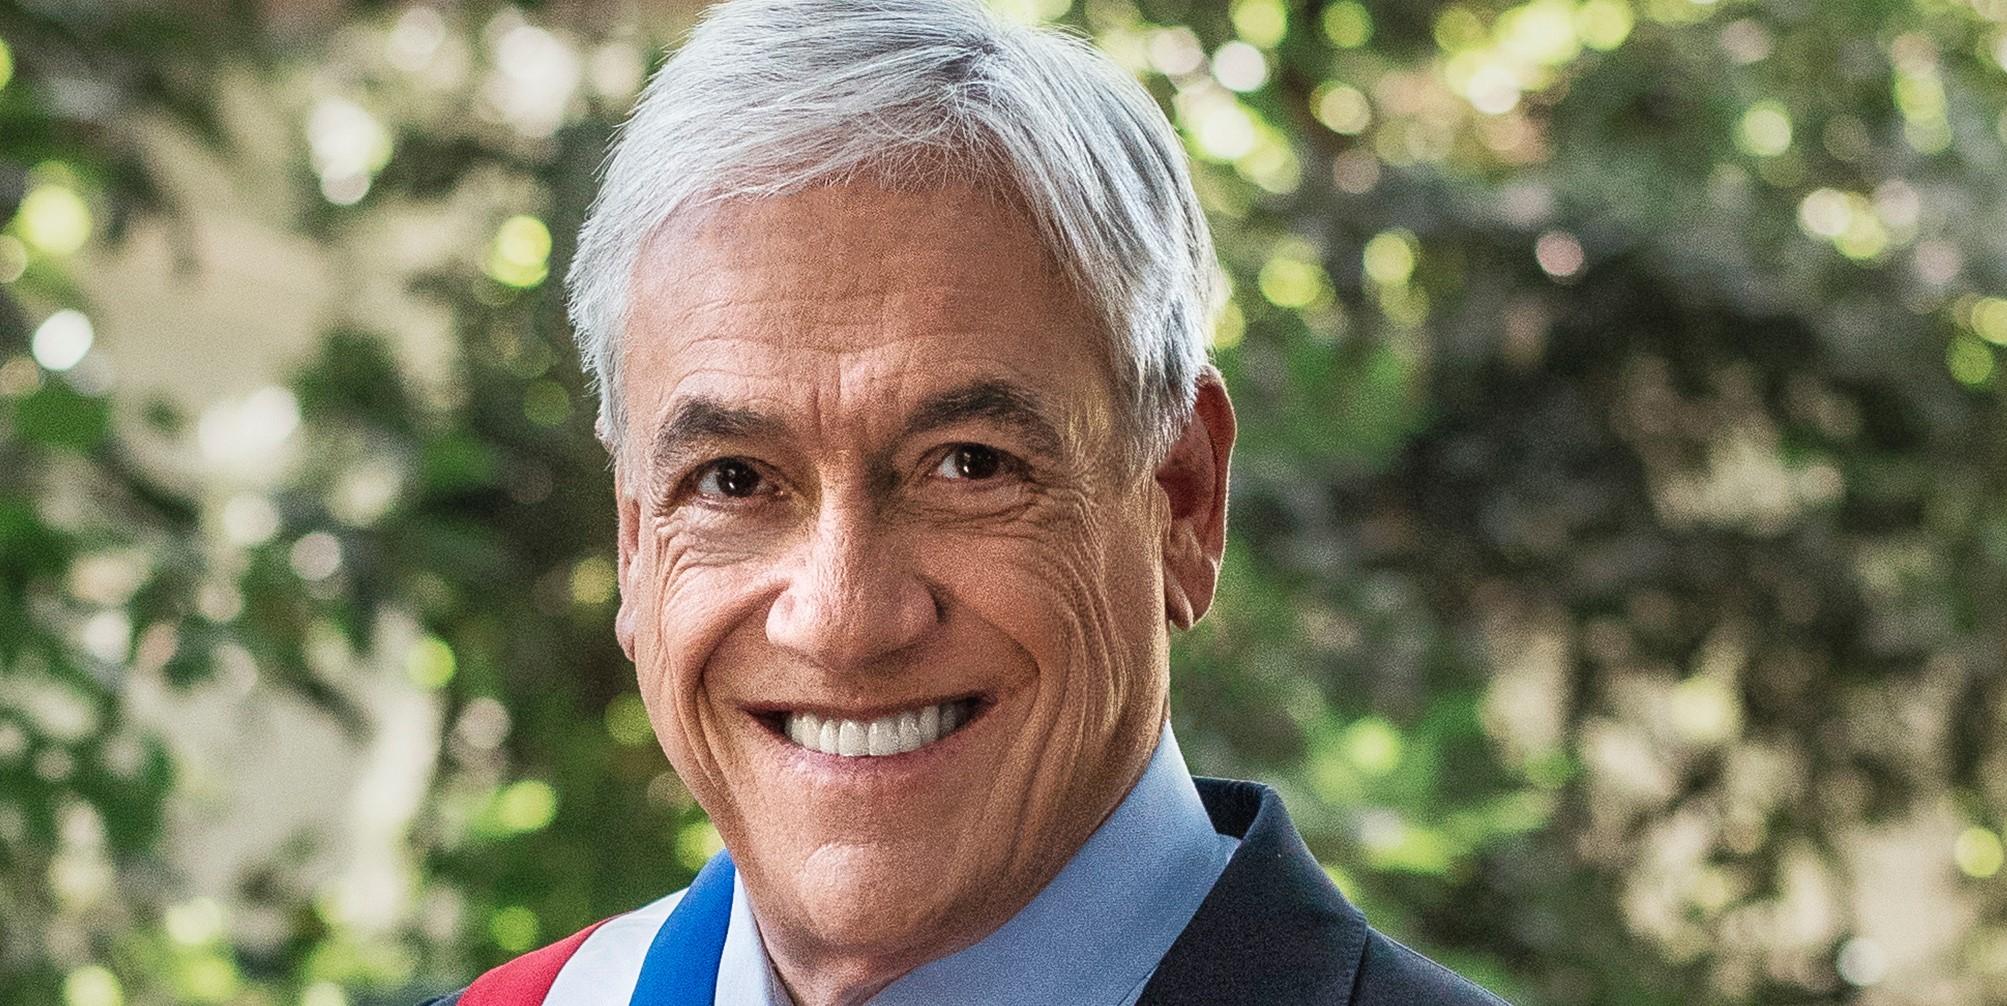 Biografía de Sebastián Piñera